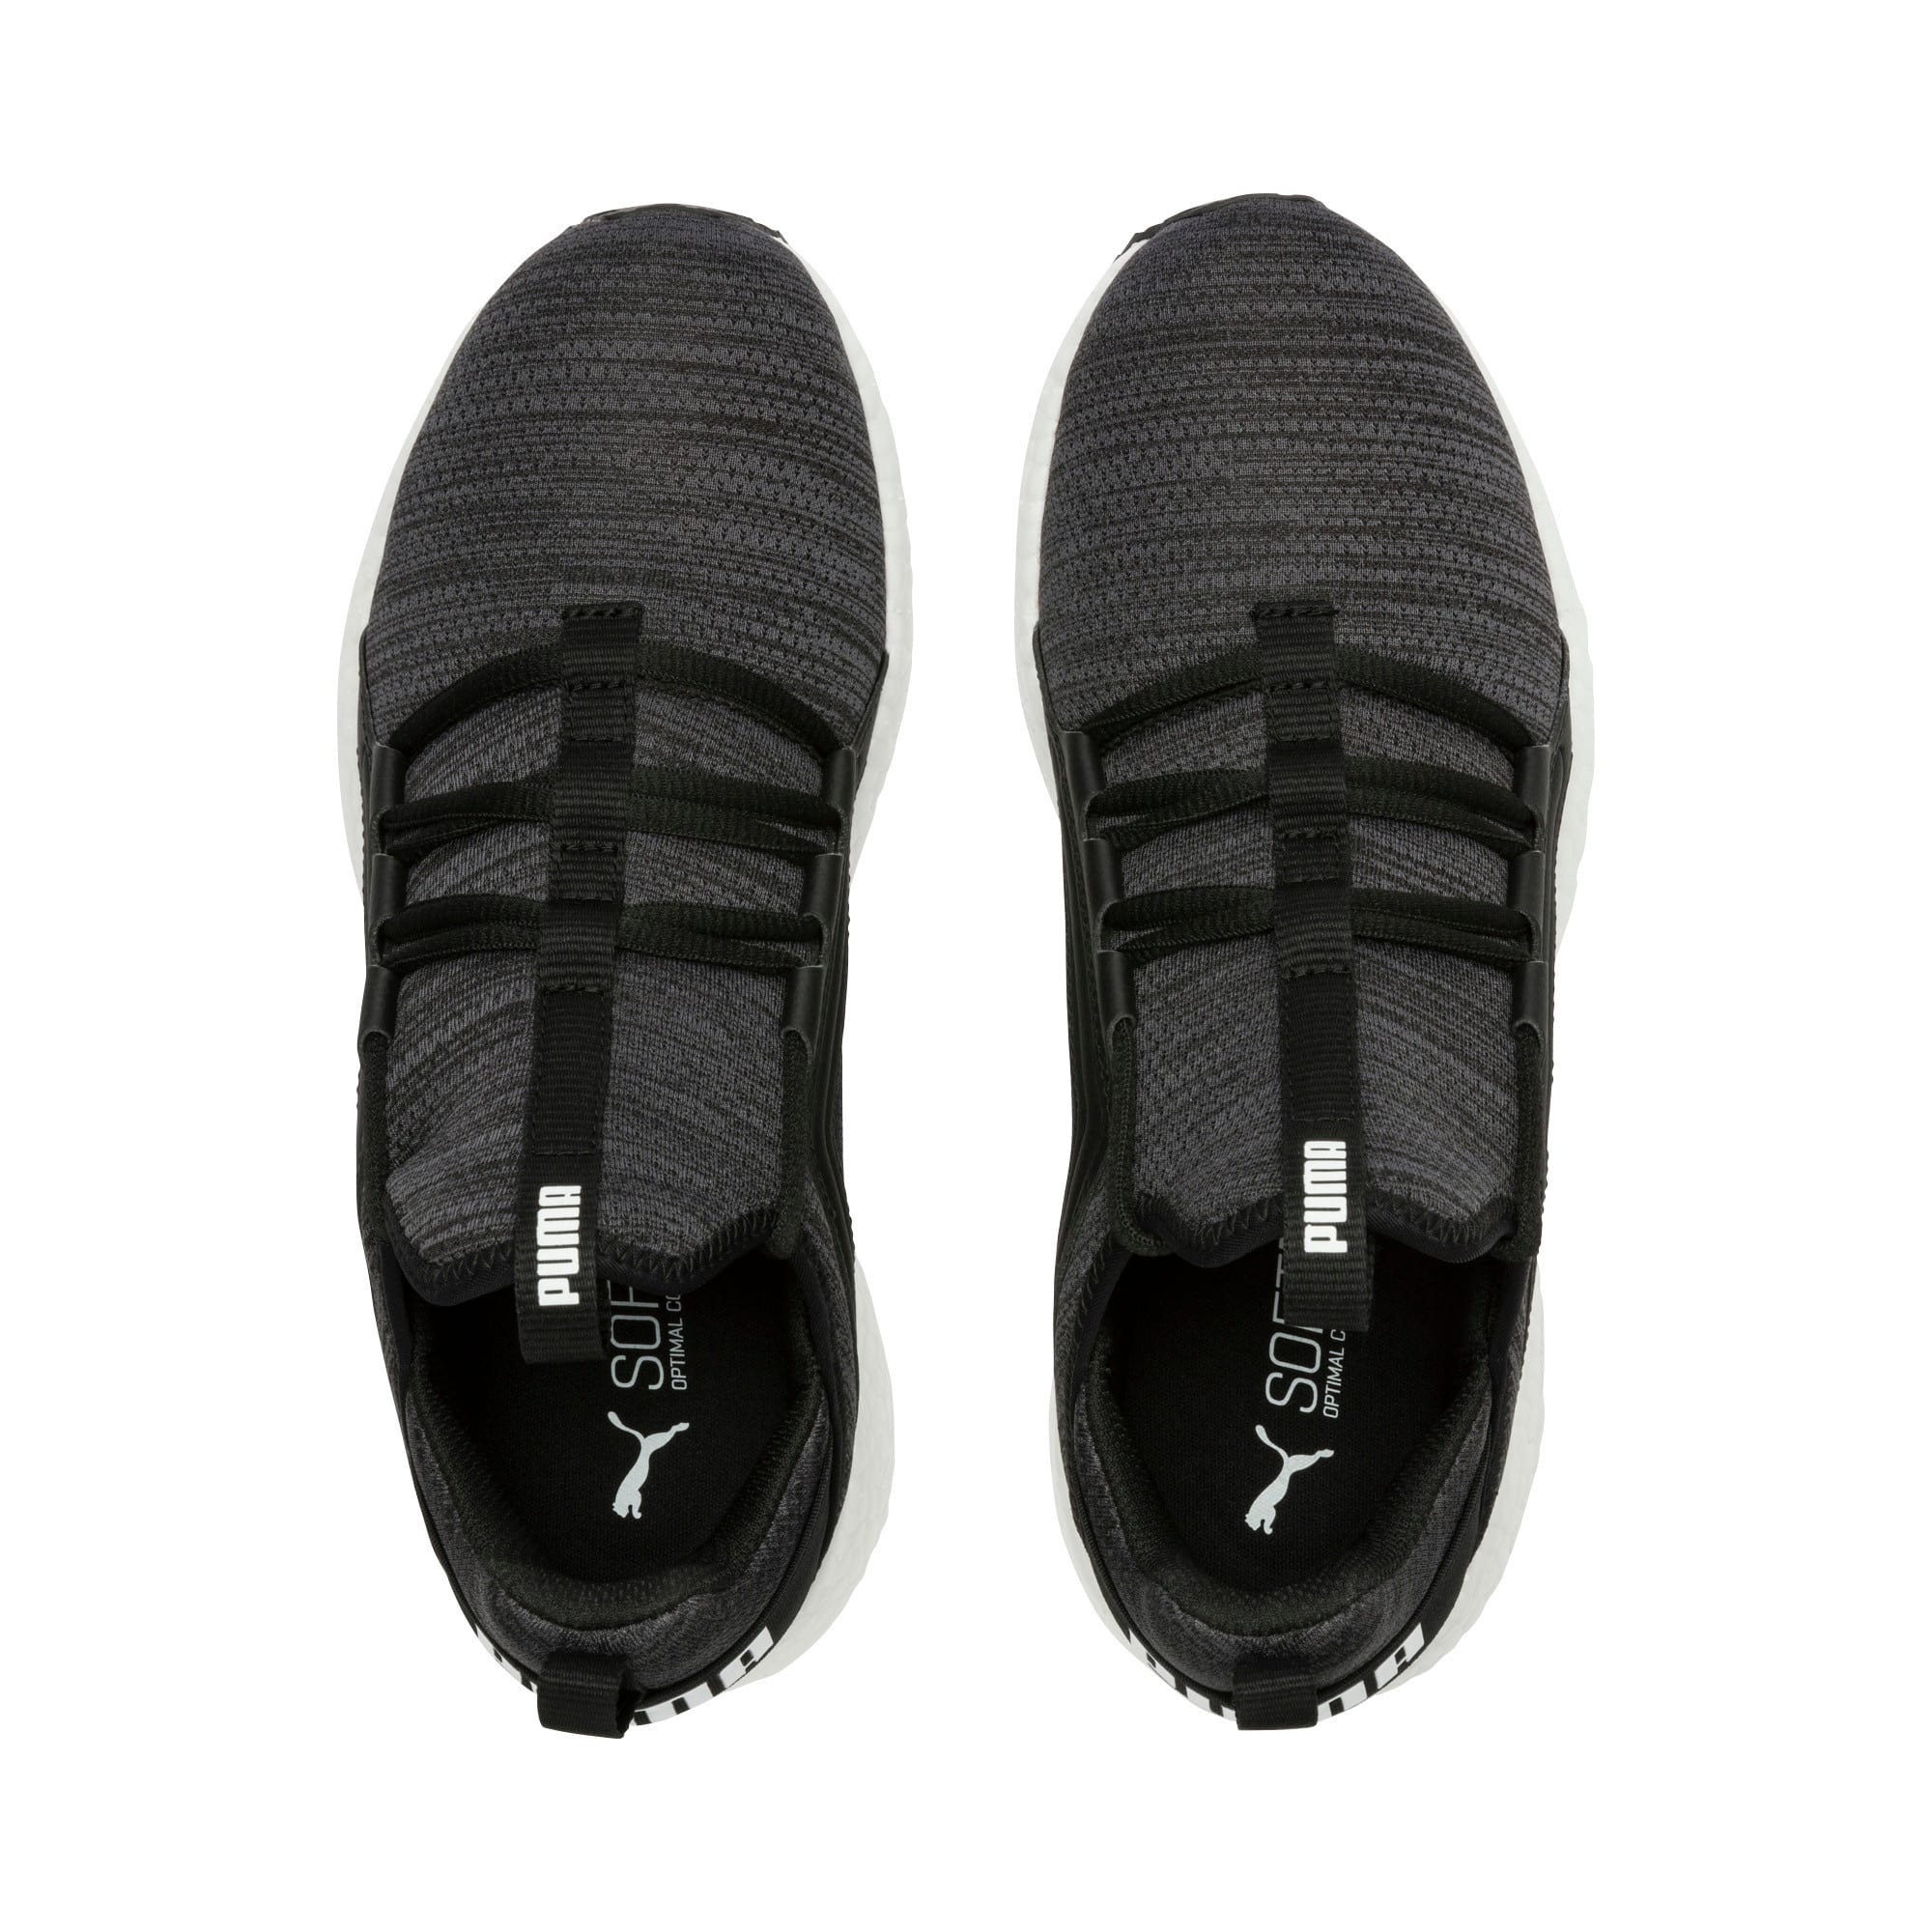 Thumbnail 4 of Mega Energy Heather Knit Women's Running Shoes, Black-Iron Gate-White, medium-IND